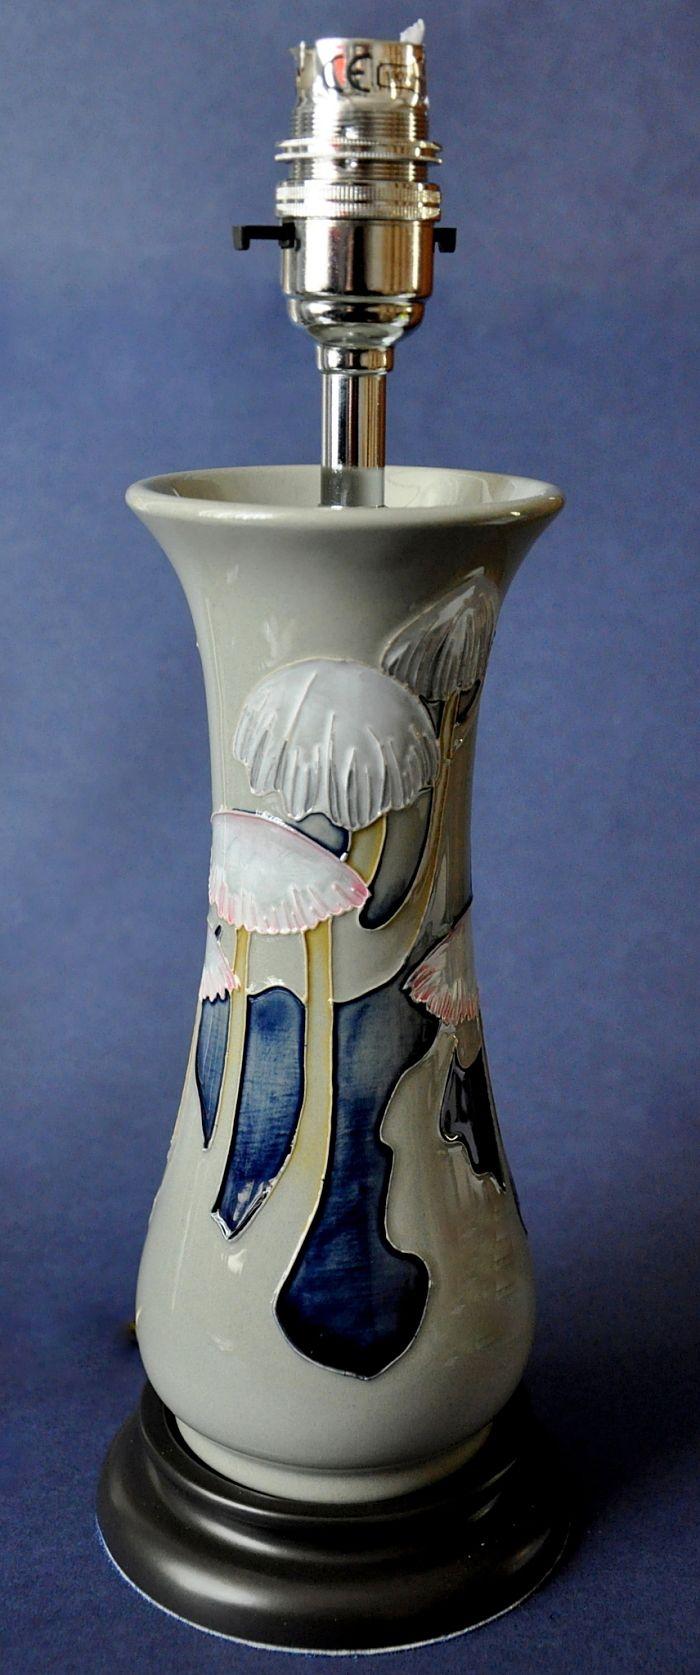 43 best moorcroft lamps i love images on pinterest lamps light moorcroft pottery moorcroft lamps and moorcroft enamels moorcroft prices from leading stockists bw thornton of stratford upon avon aloadofball Images